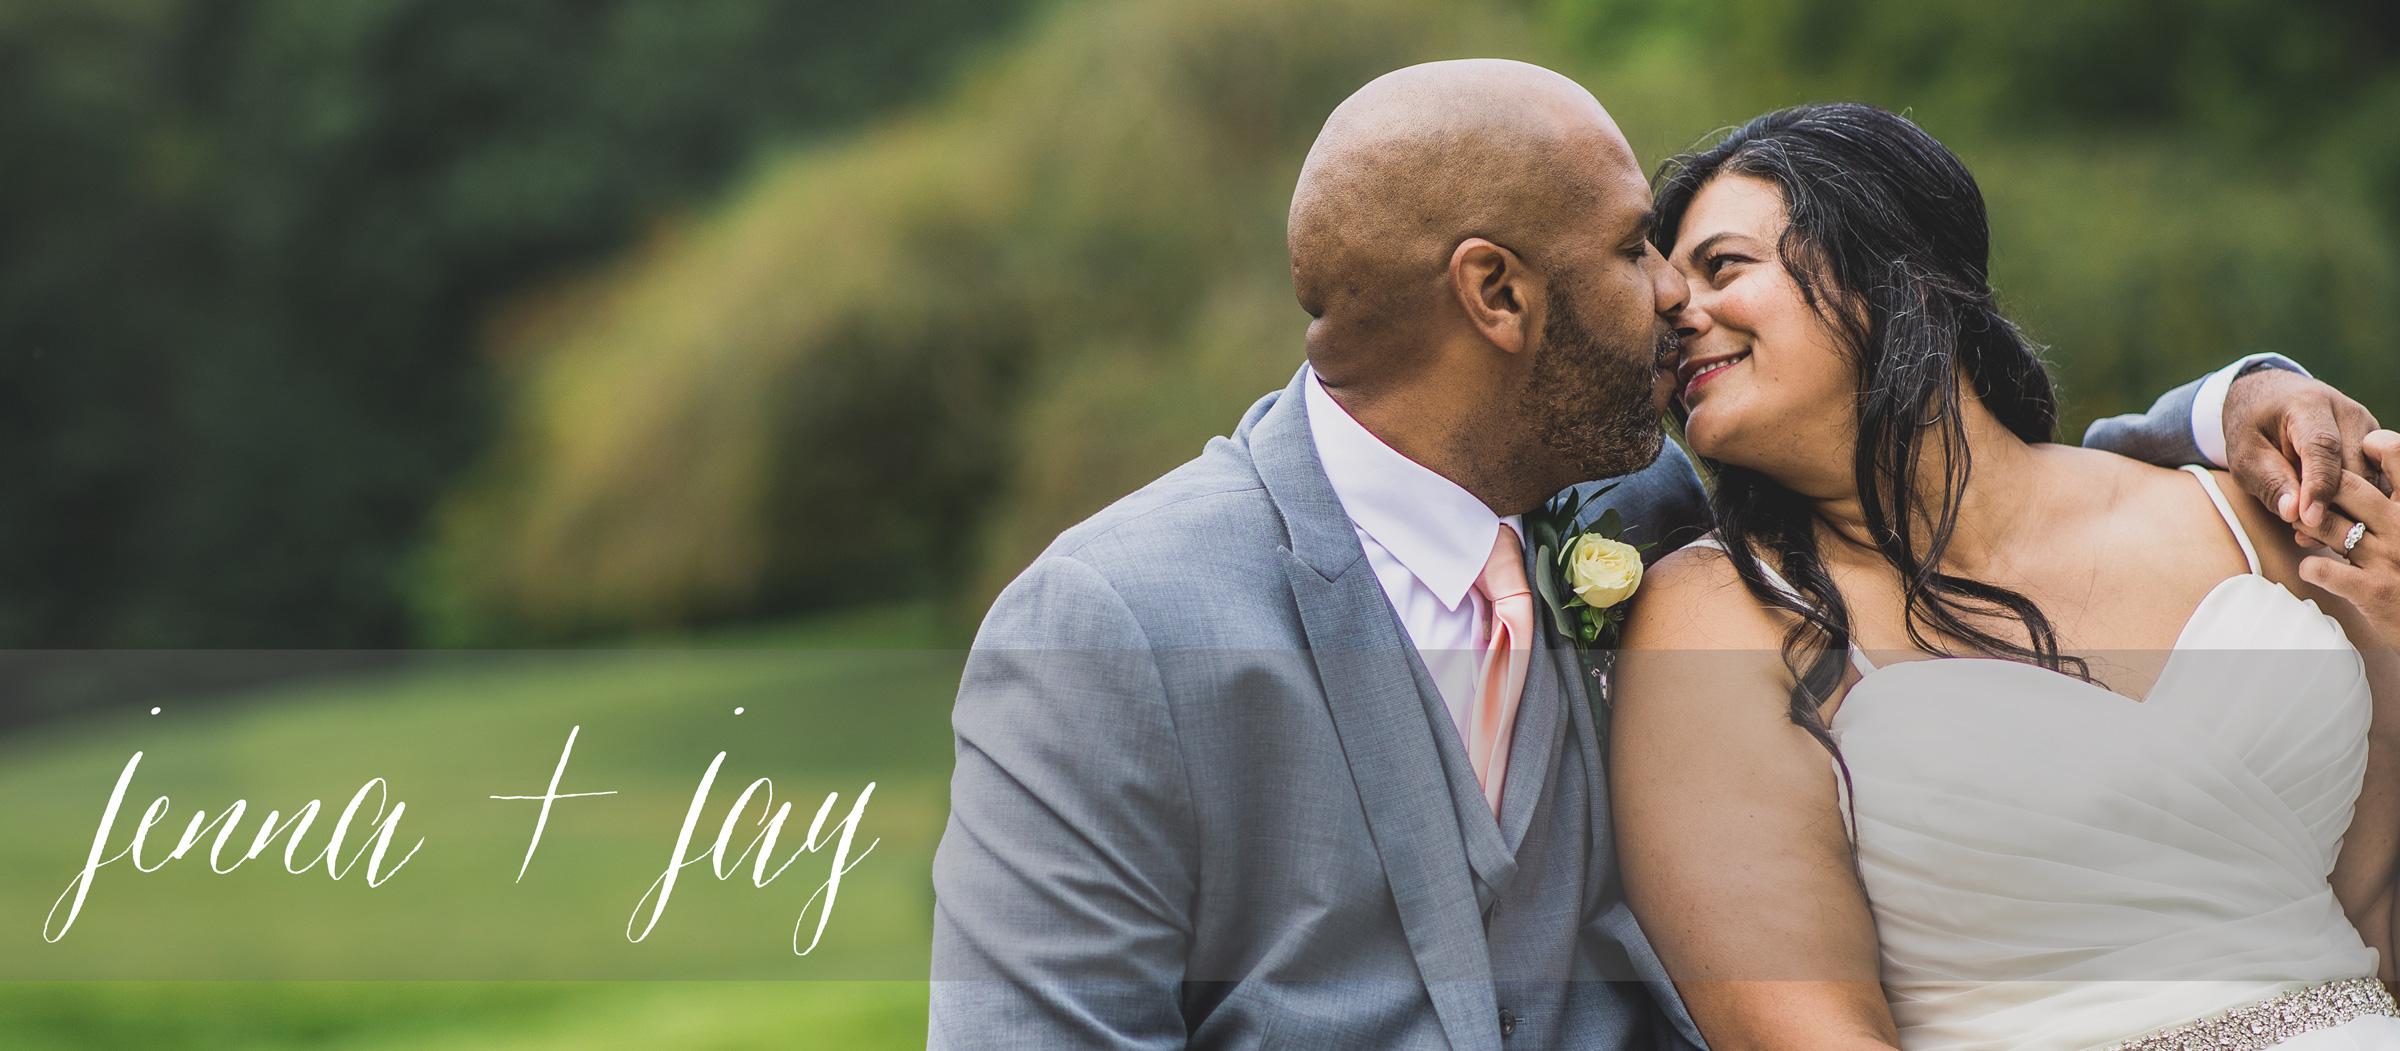 jennajay.best washington DC wedding photographers casual genuine color story.jpg